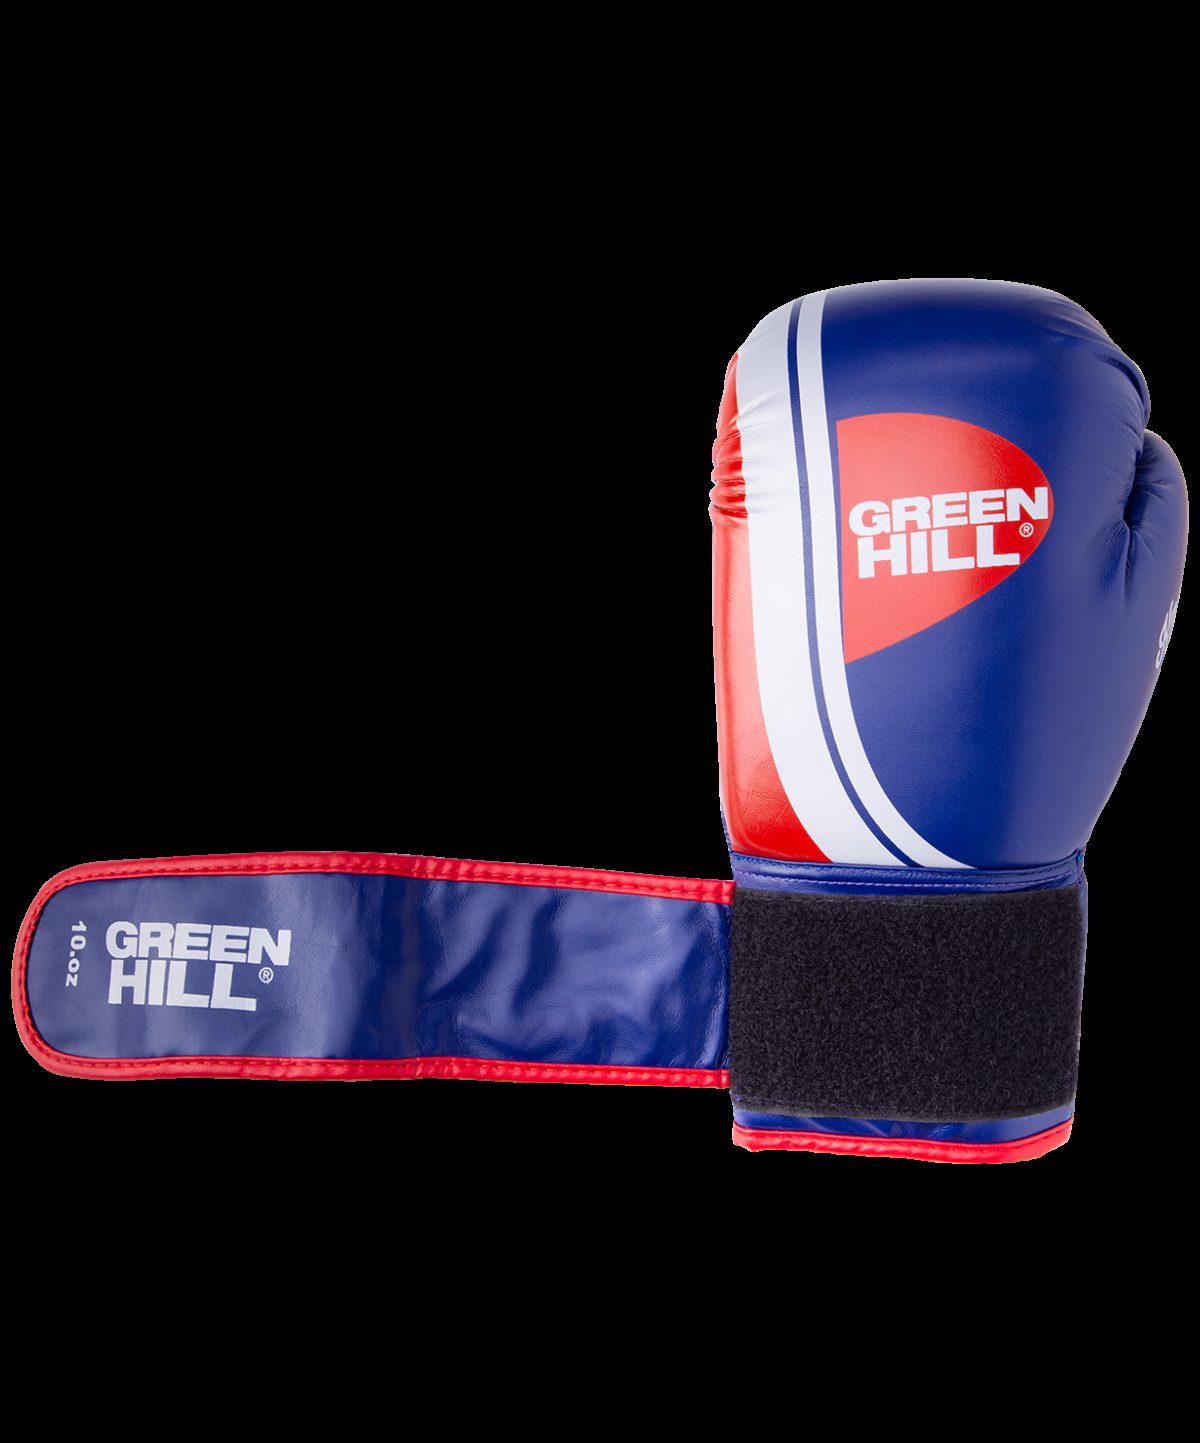 GREEN HILL Перчатки боксерские 10 oz Knockout  BGK-2266: синий - 4